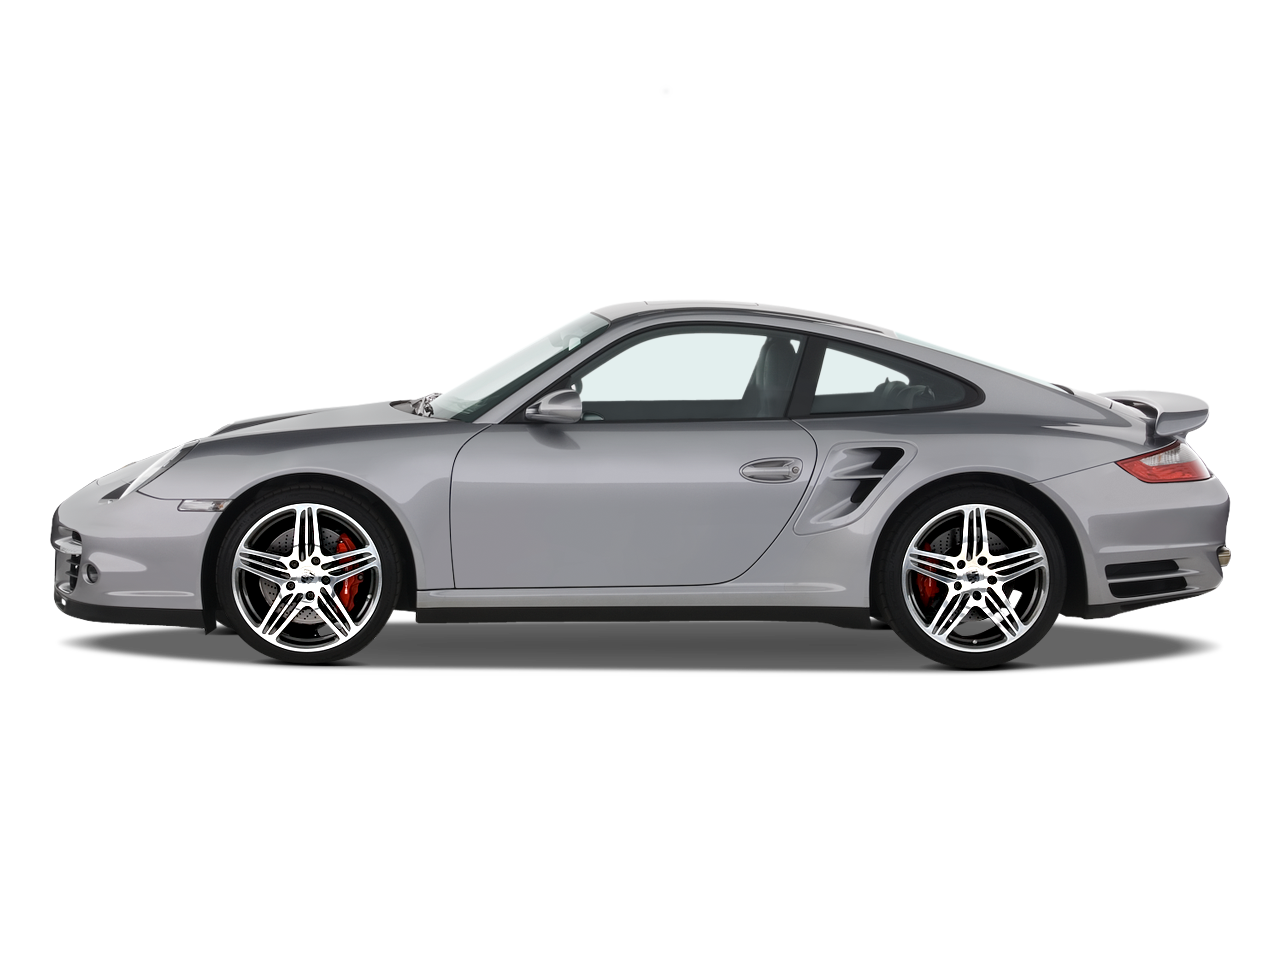 2008 porsche 911 gt2 latest news features and reviews automobile magazine. Black Bedroom Furniture Sets. Home Design Ideas